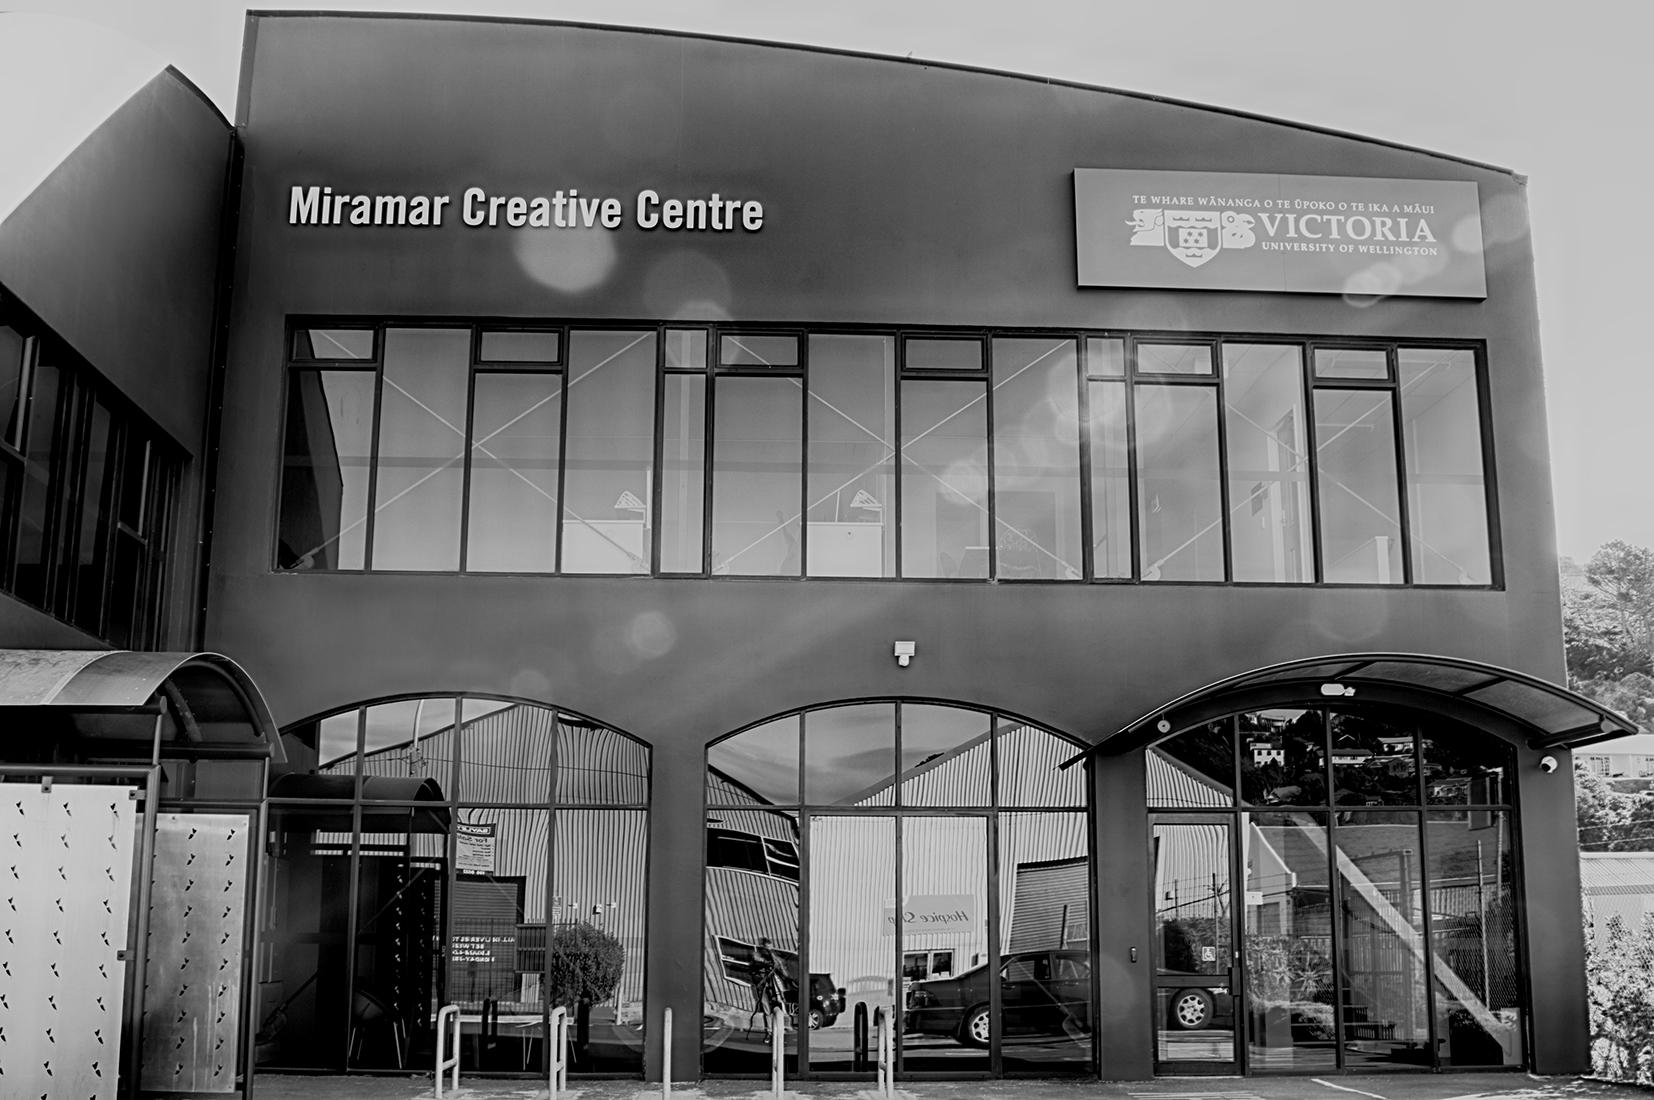 Miramar Creative Centre